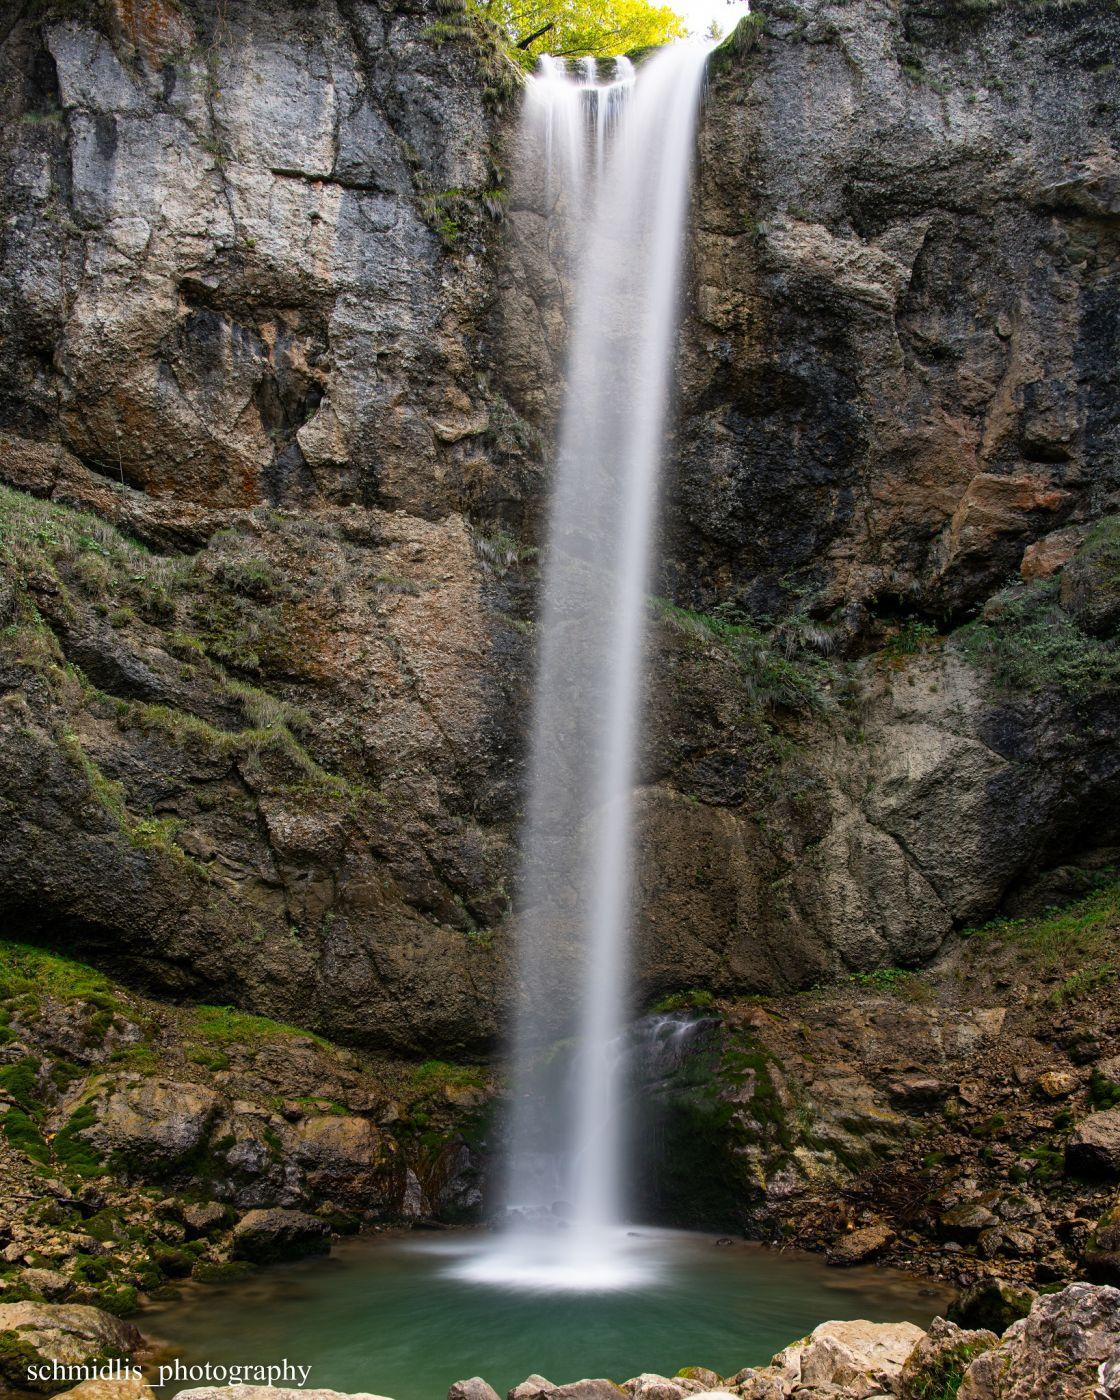 Leuenfall Wasserfall, Switzerland